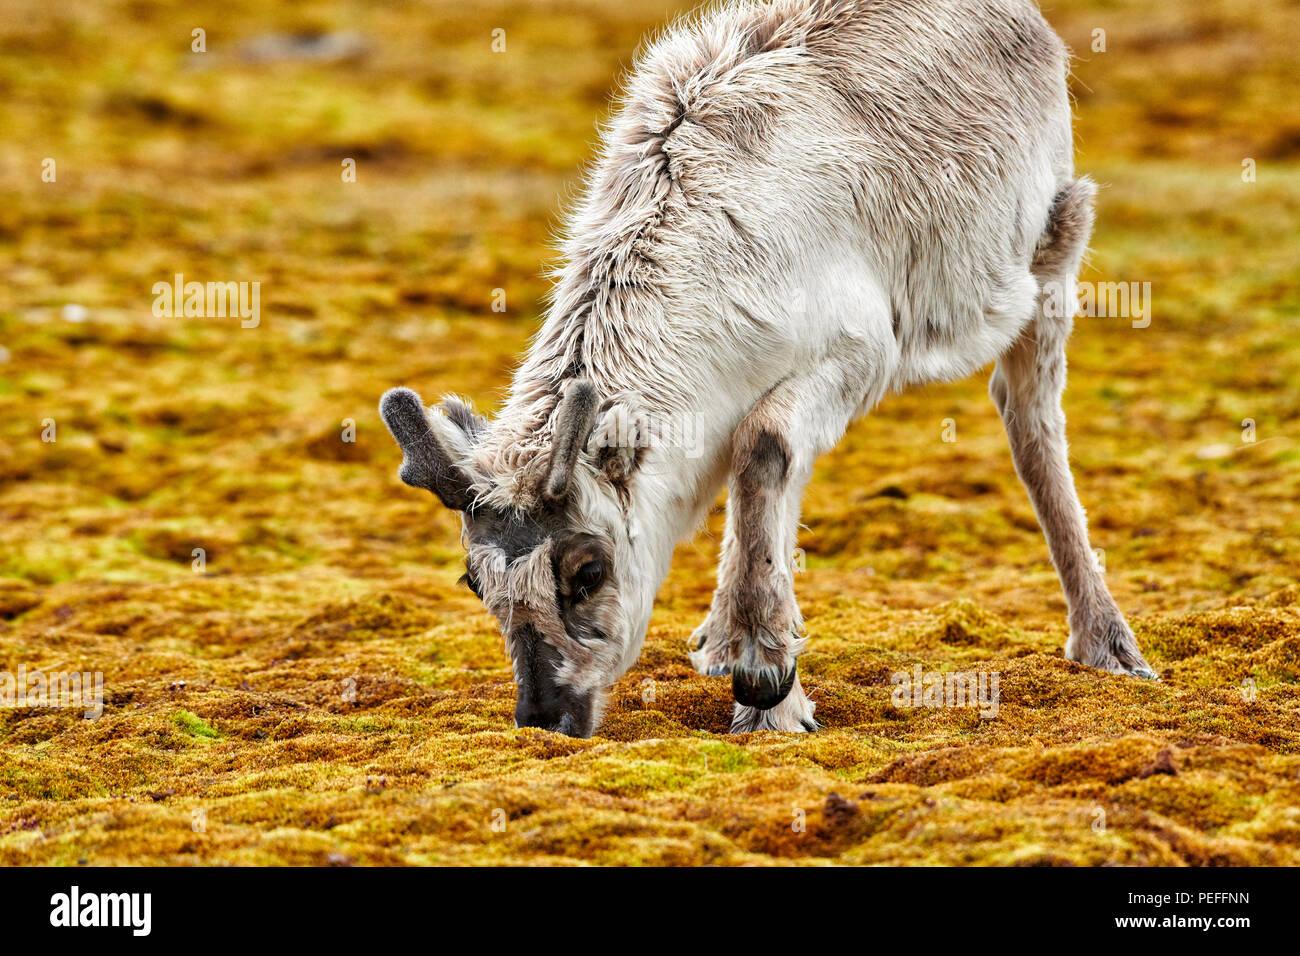 Neugierige junge Svalbard Rentier (Rangifer tarandus platyrhynchus) oder Spitzbergen, Svalbard, Europa Stockfoto